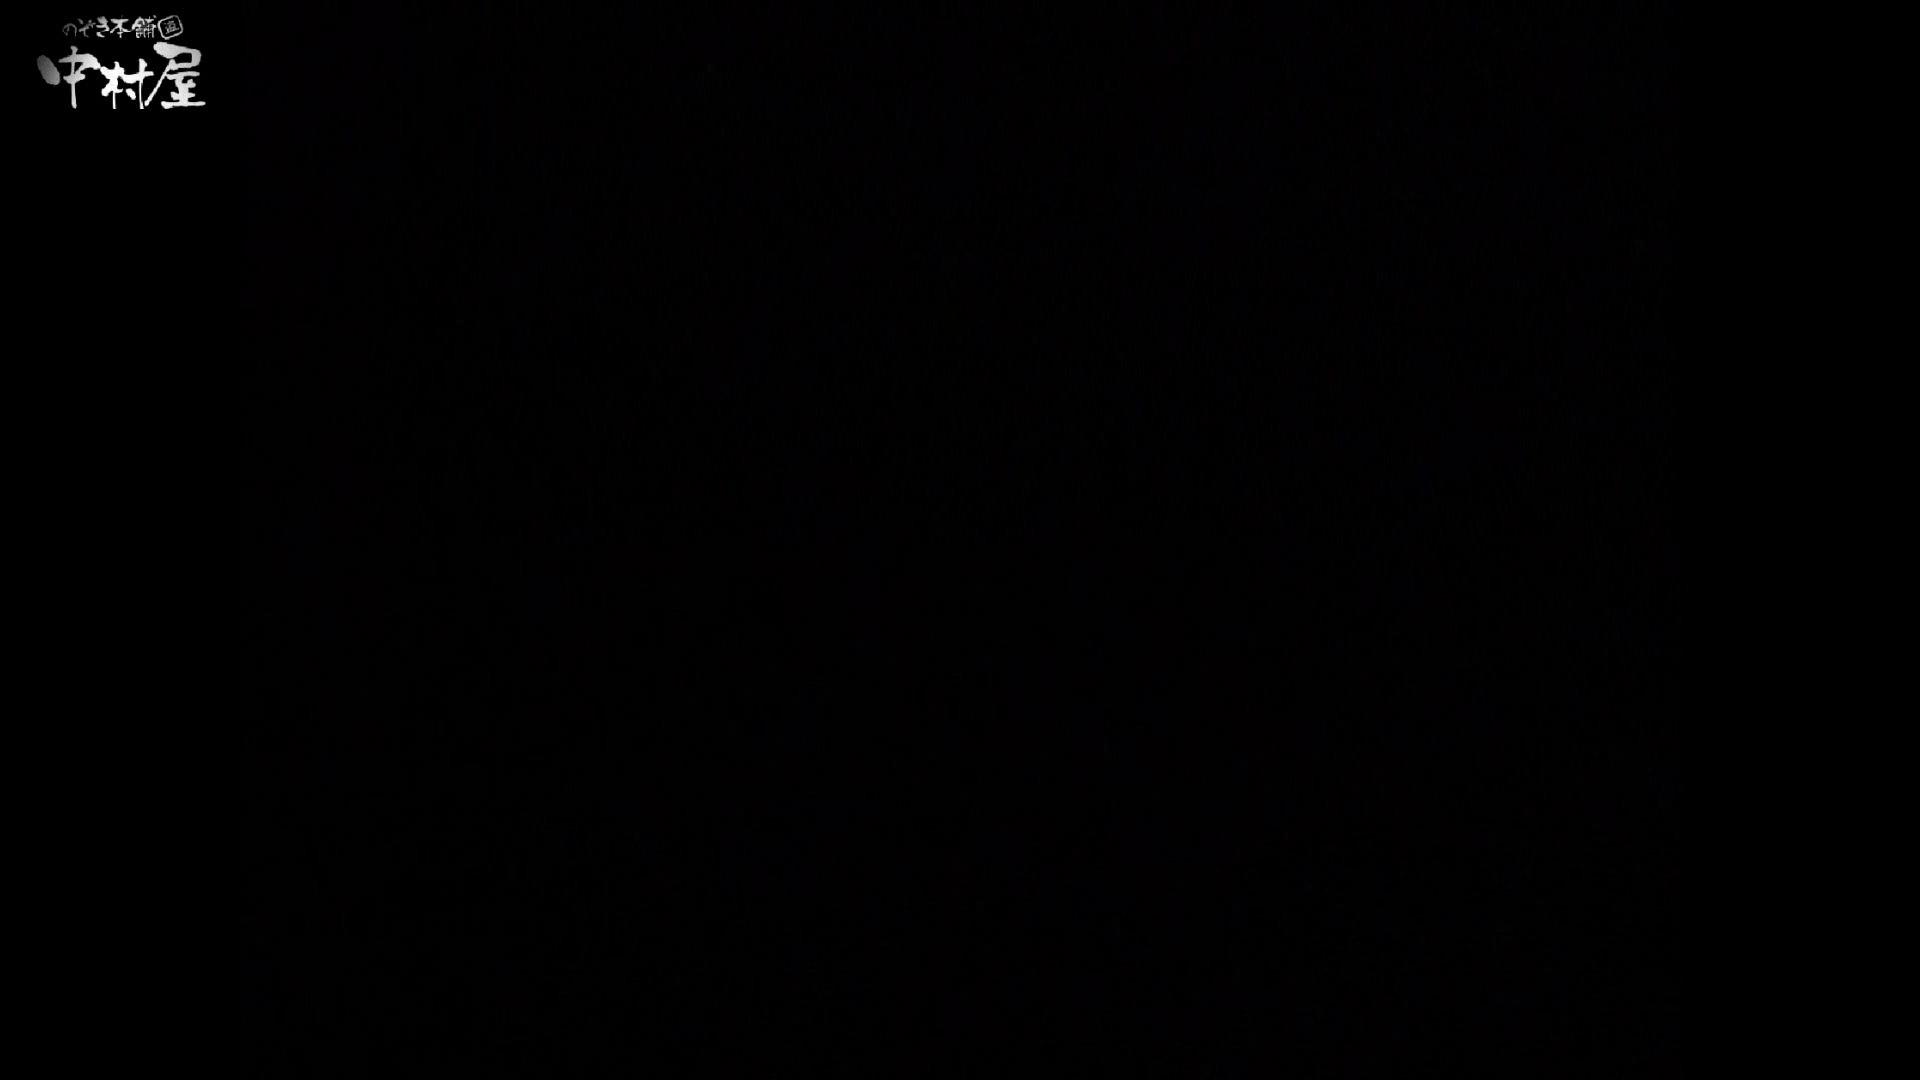 民家風呂専門盗撮師の超危険映像 vol.016 お色気美少女 エロ無料画像 86枚 23